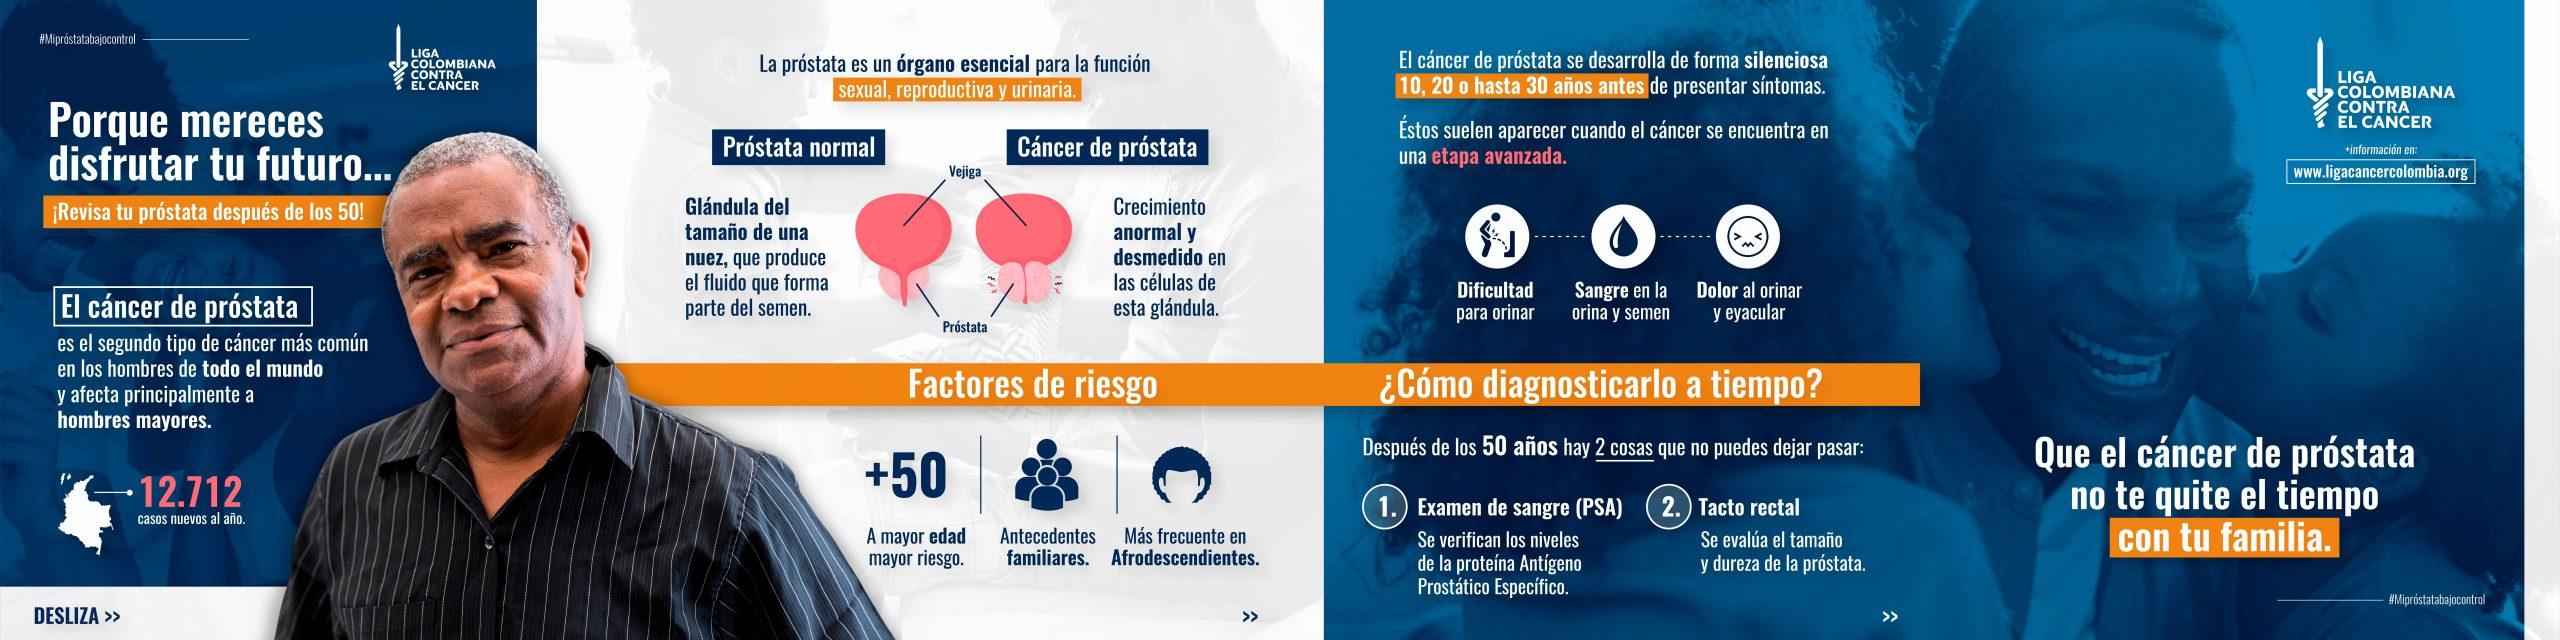 Infografía Cáncer de Próstata